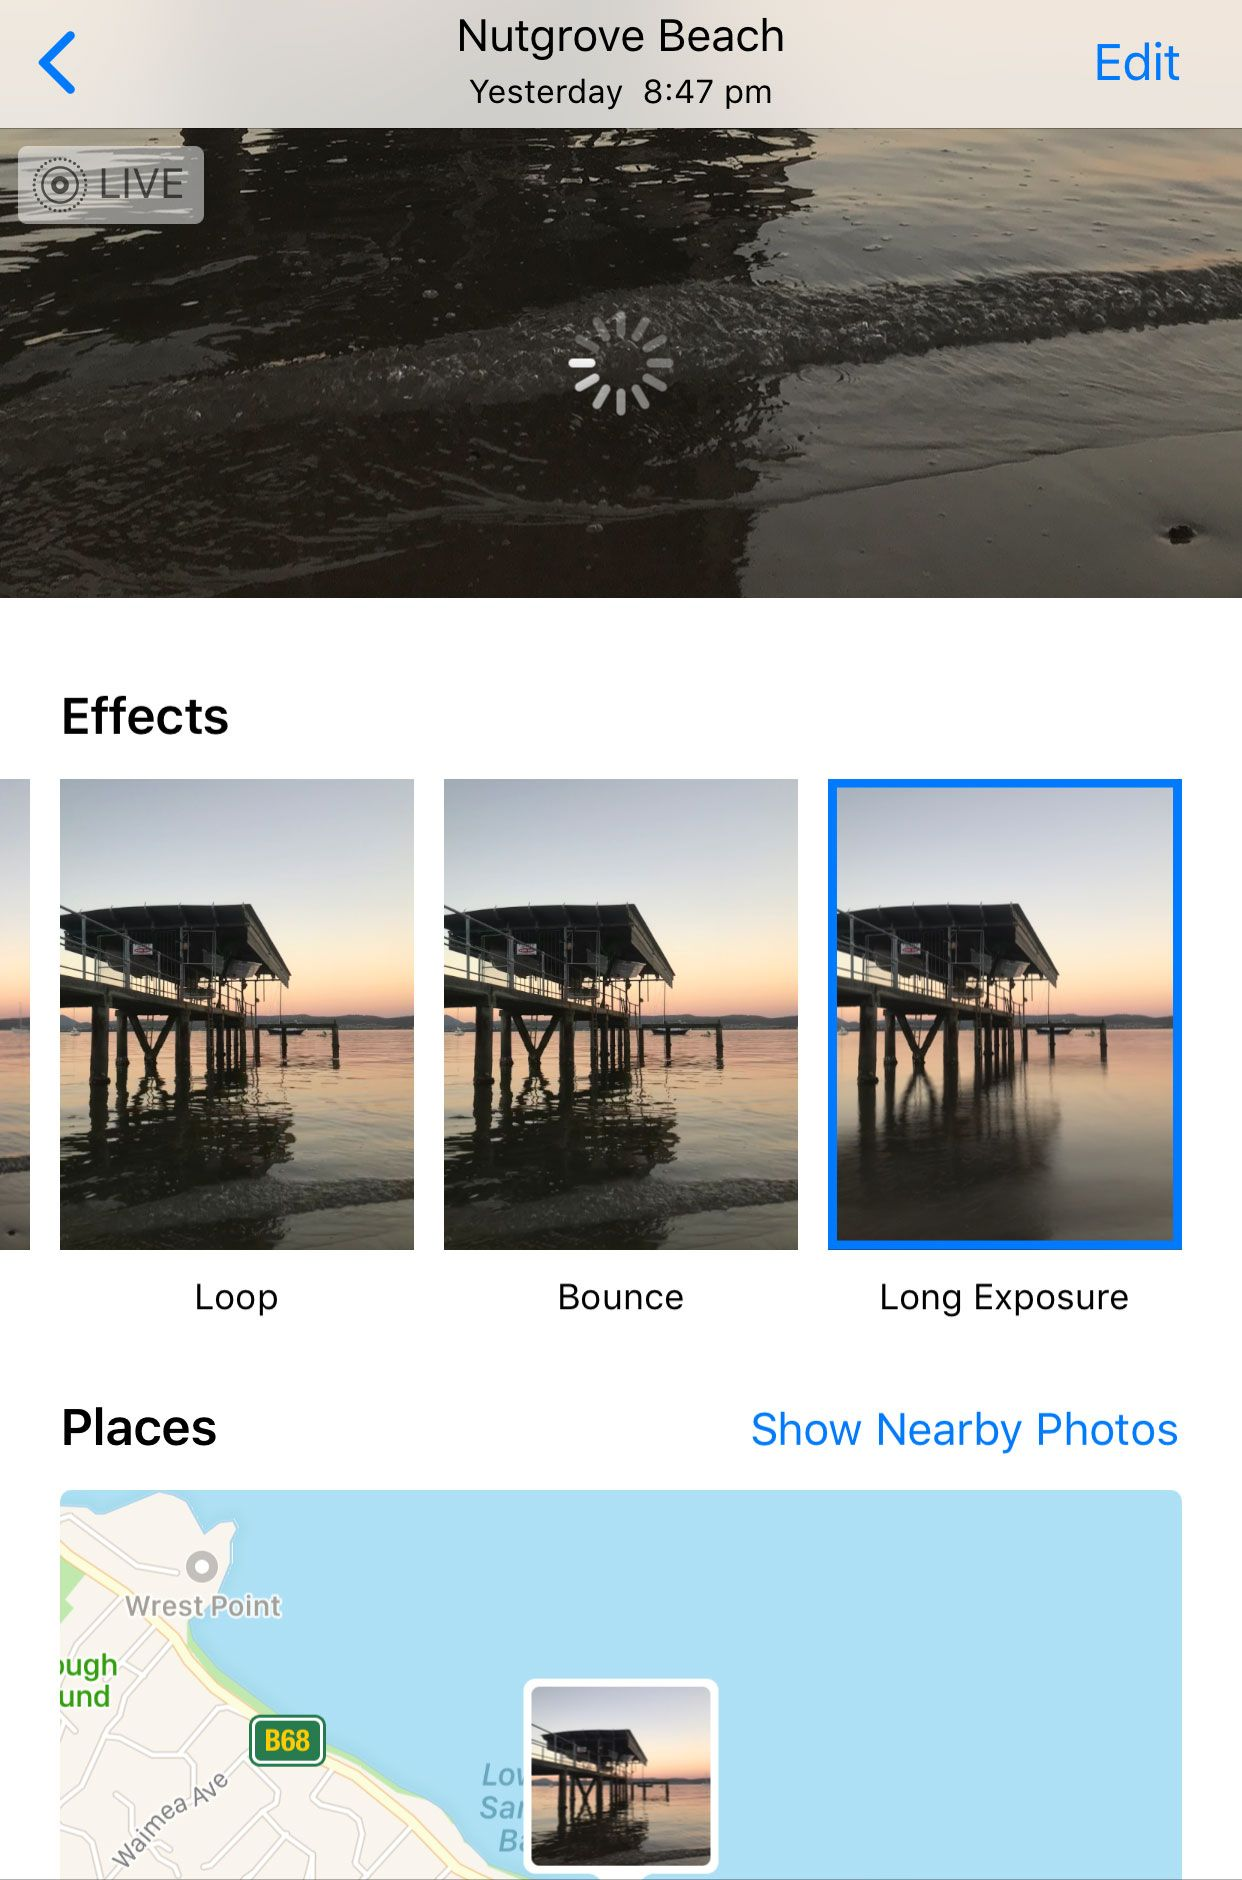 swipe to access long exposure